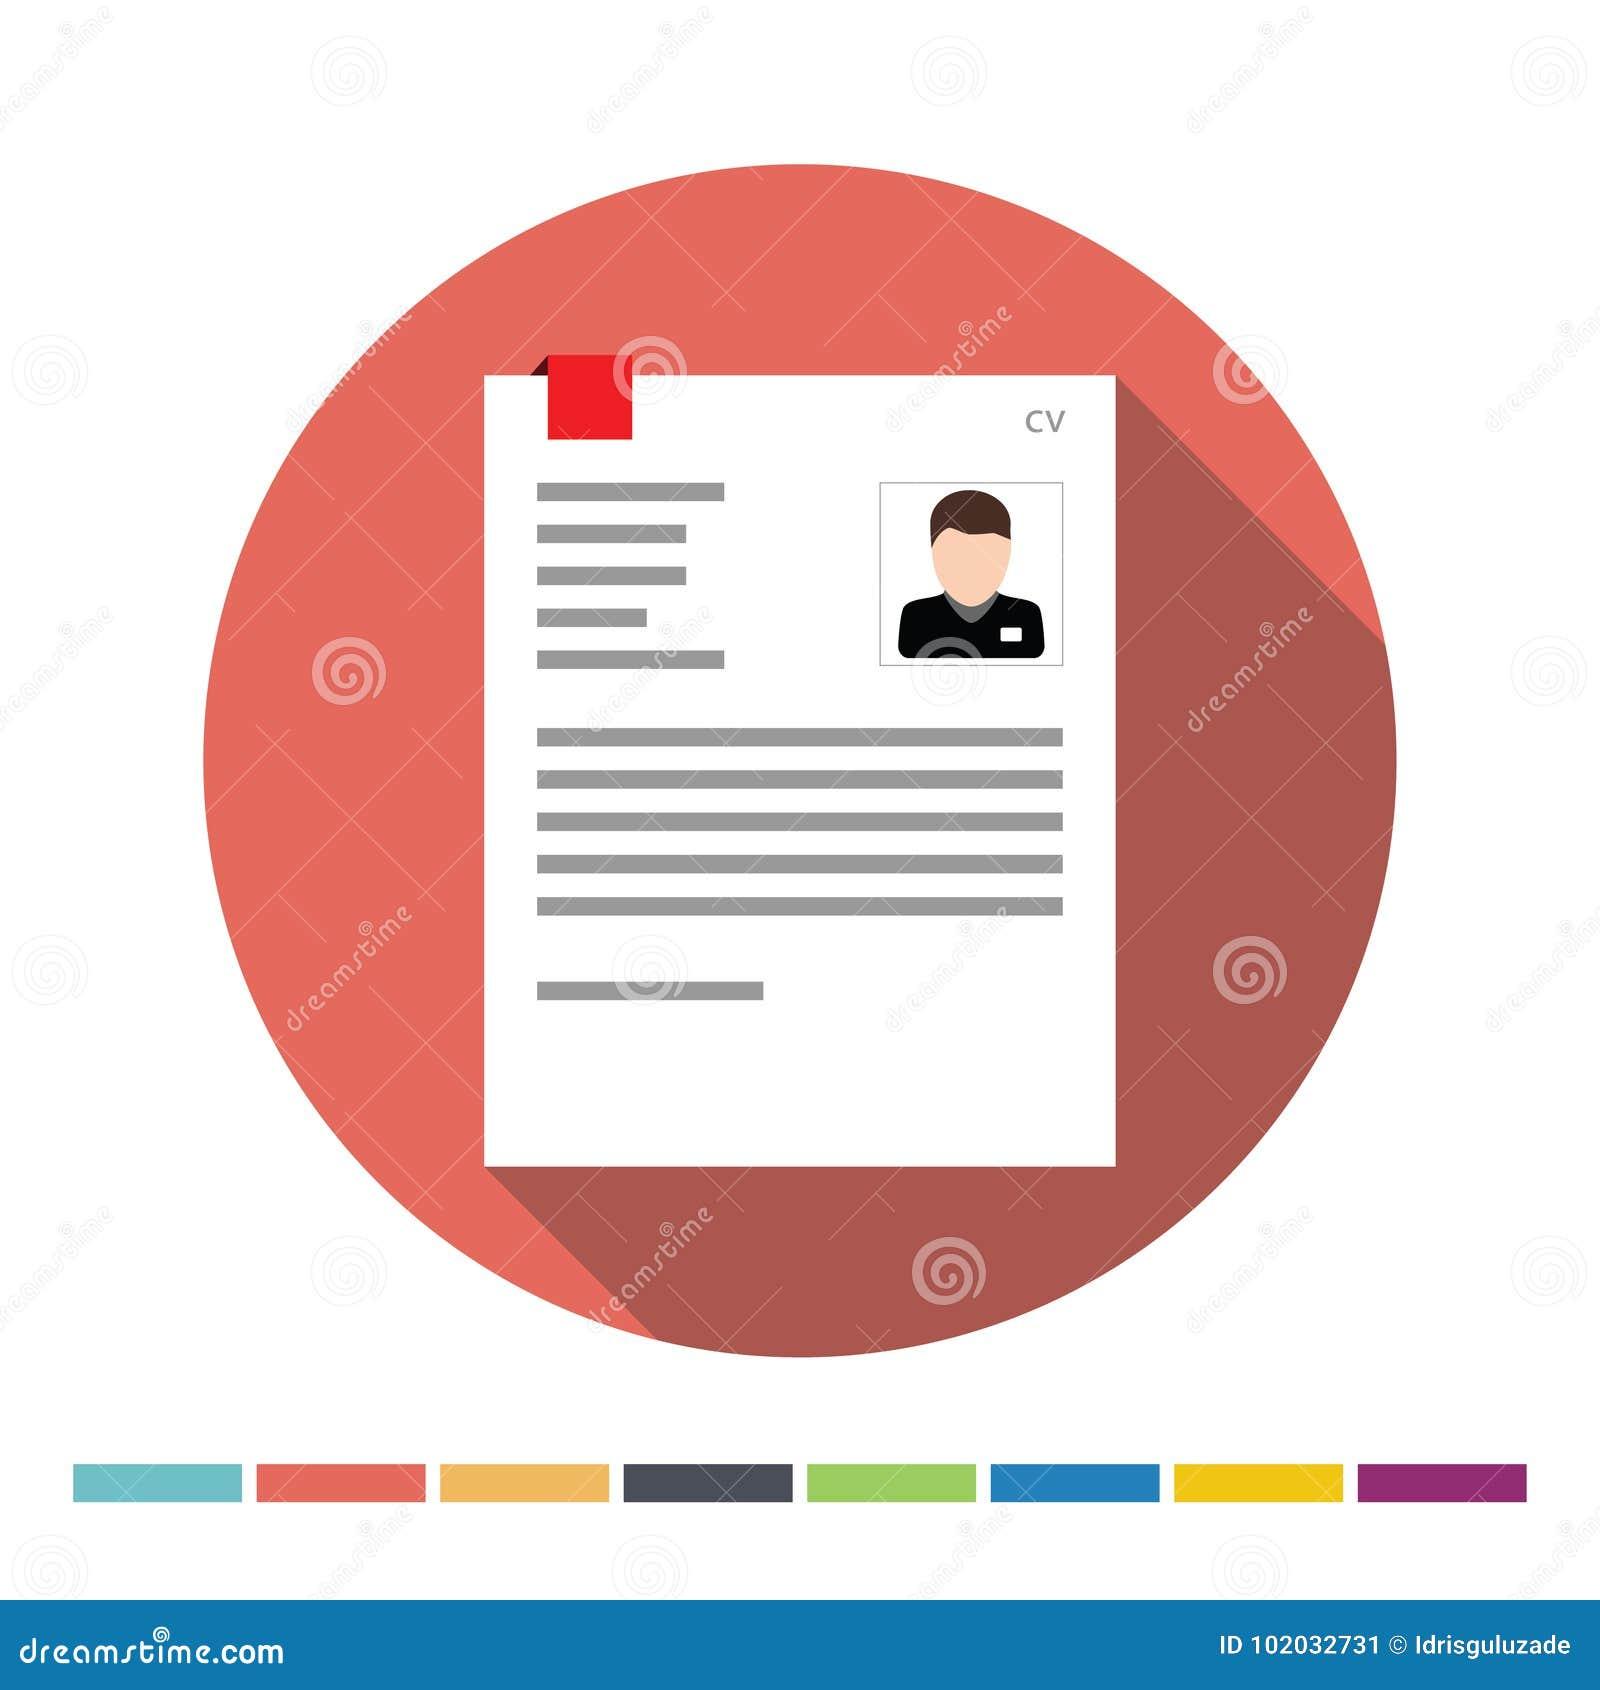 Cv Icon Stock Vector Illustration Of Employee Company 102032731